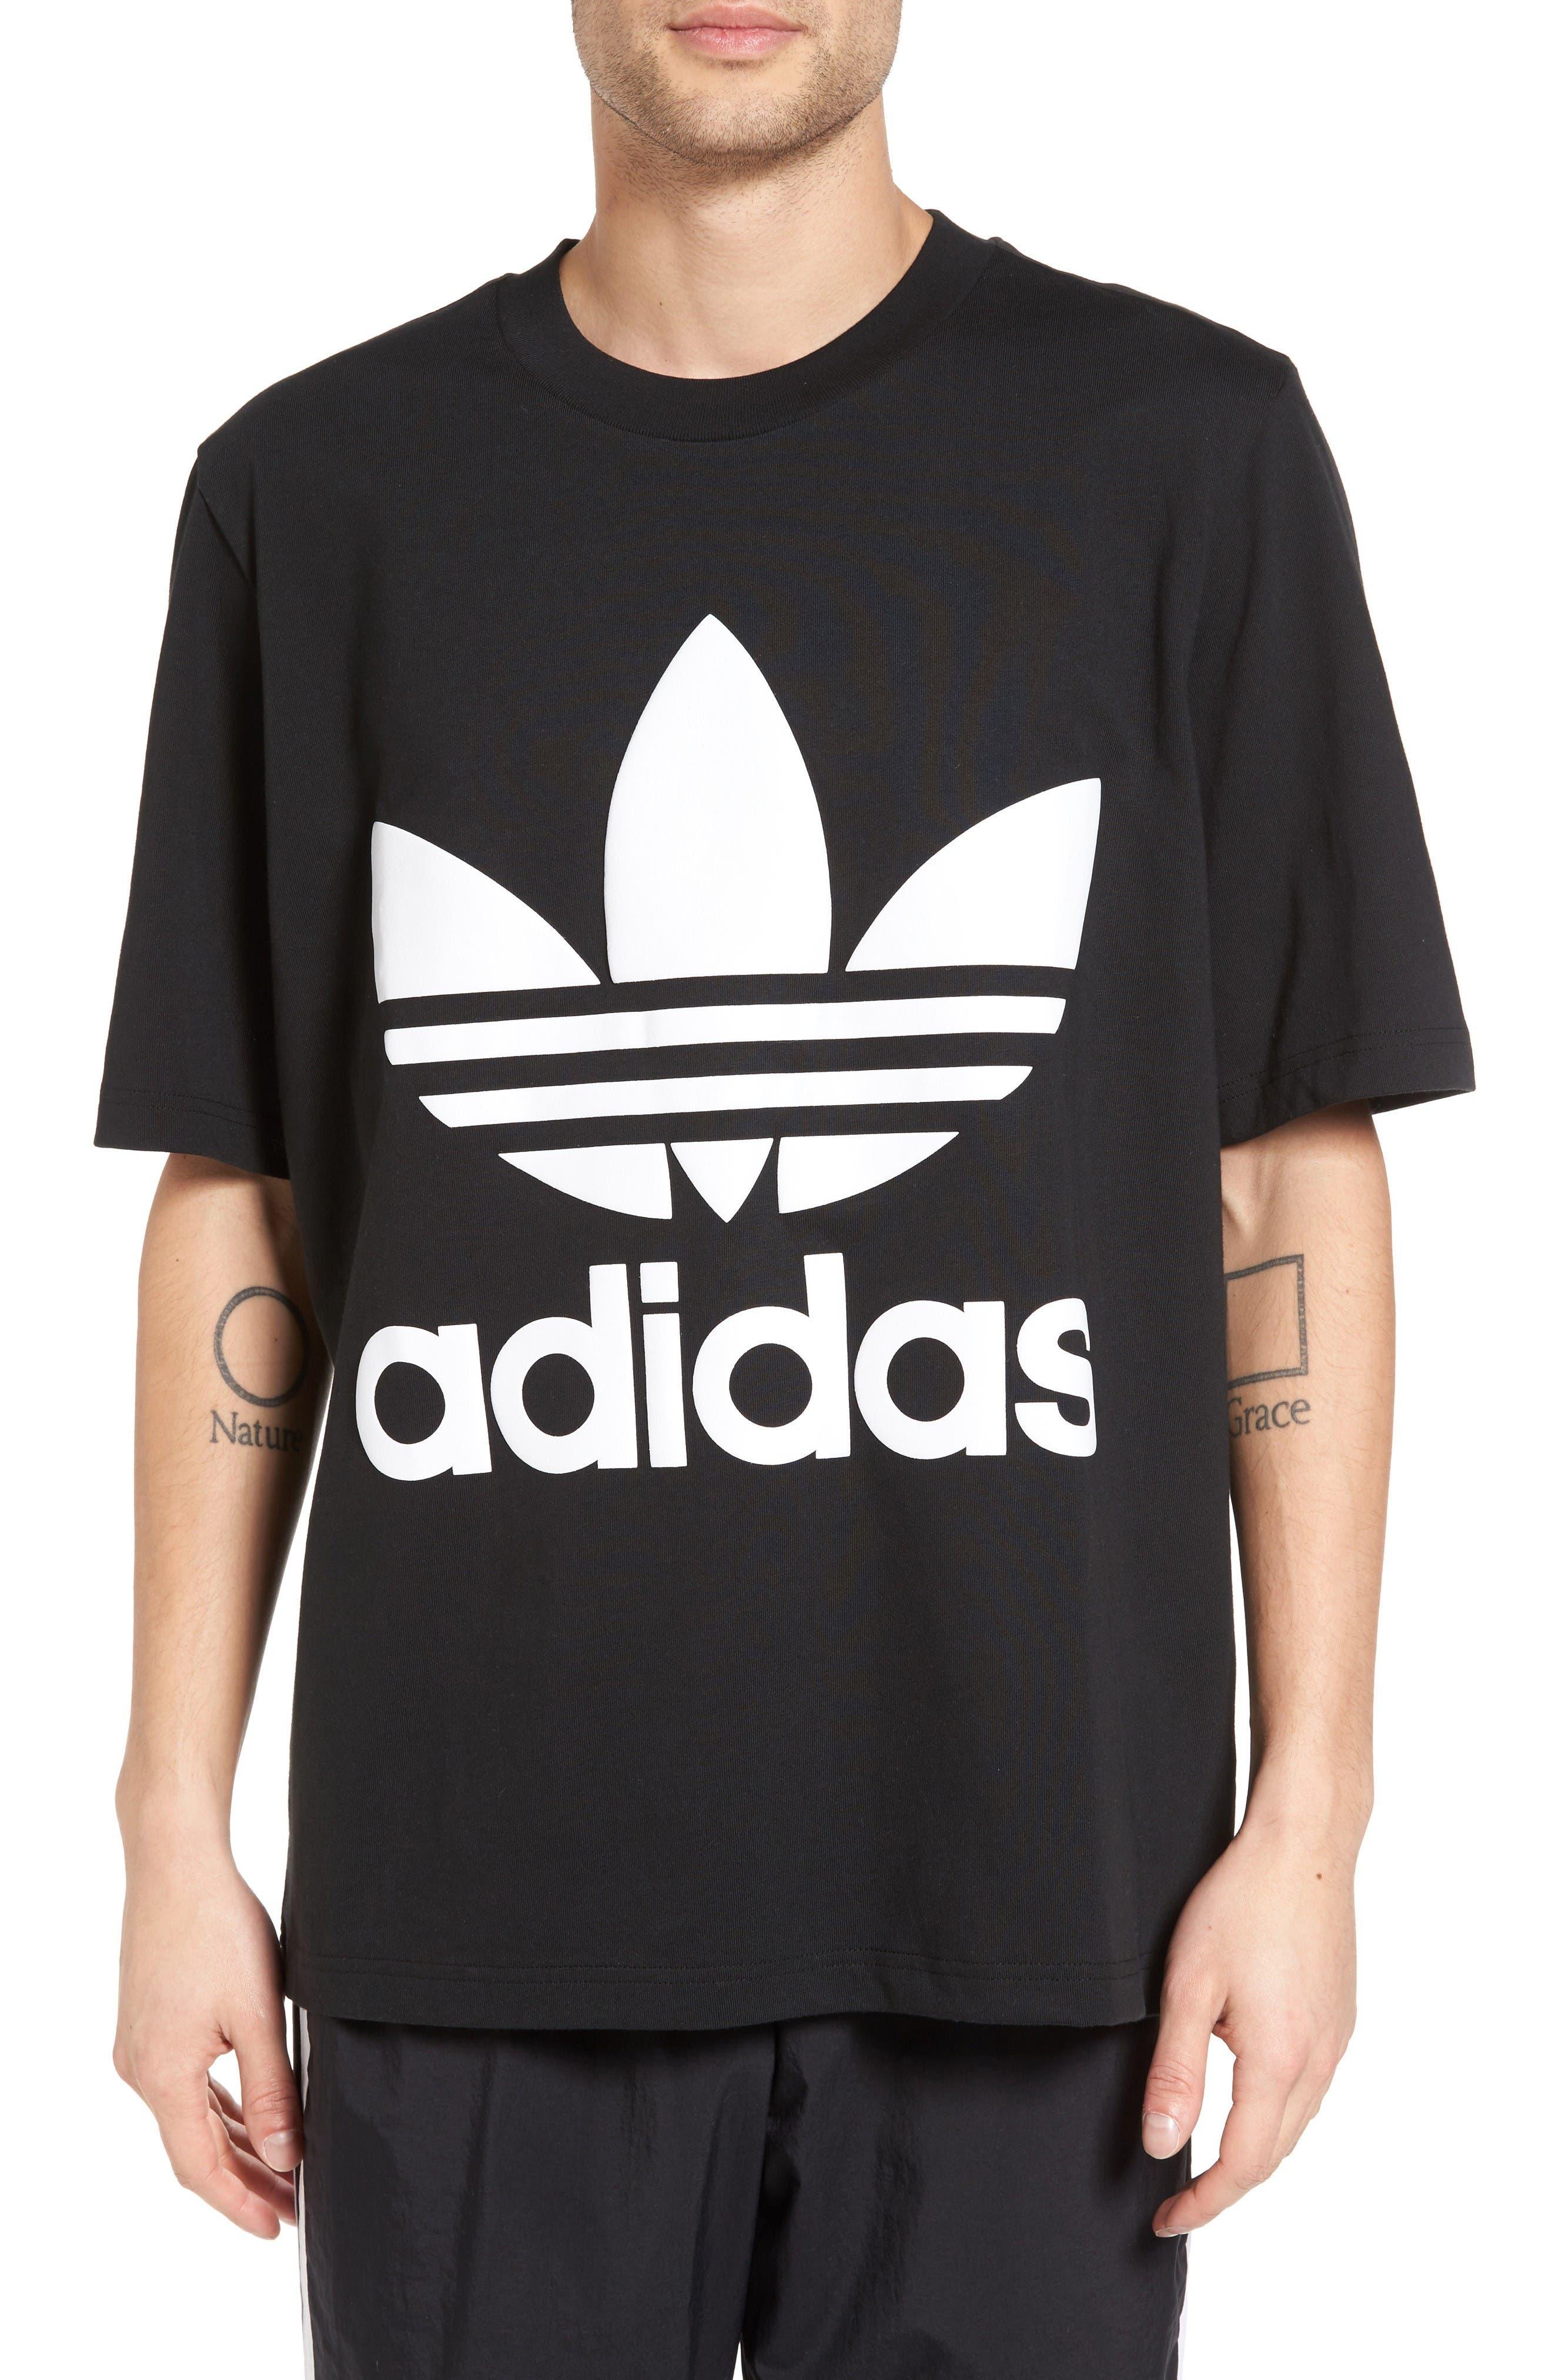 Black t shirt pic - Black T Shirt Pic 35